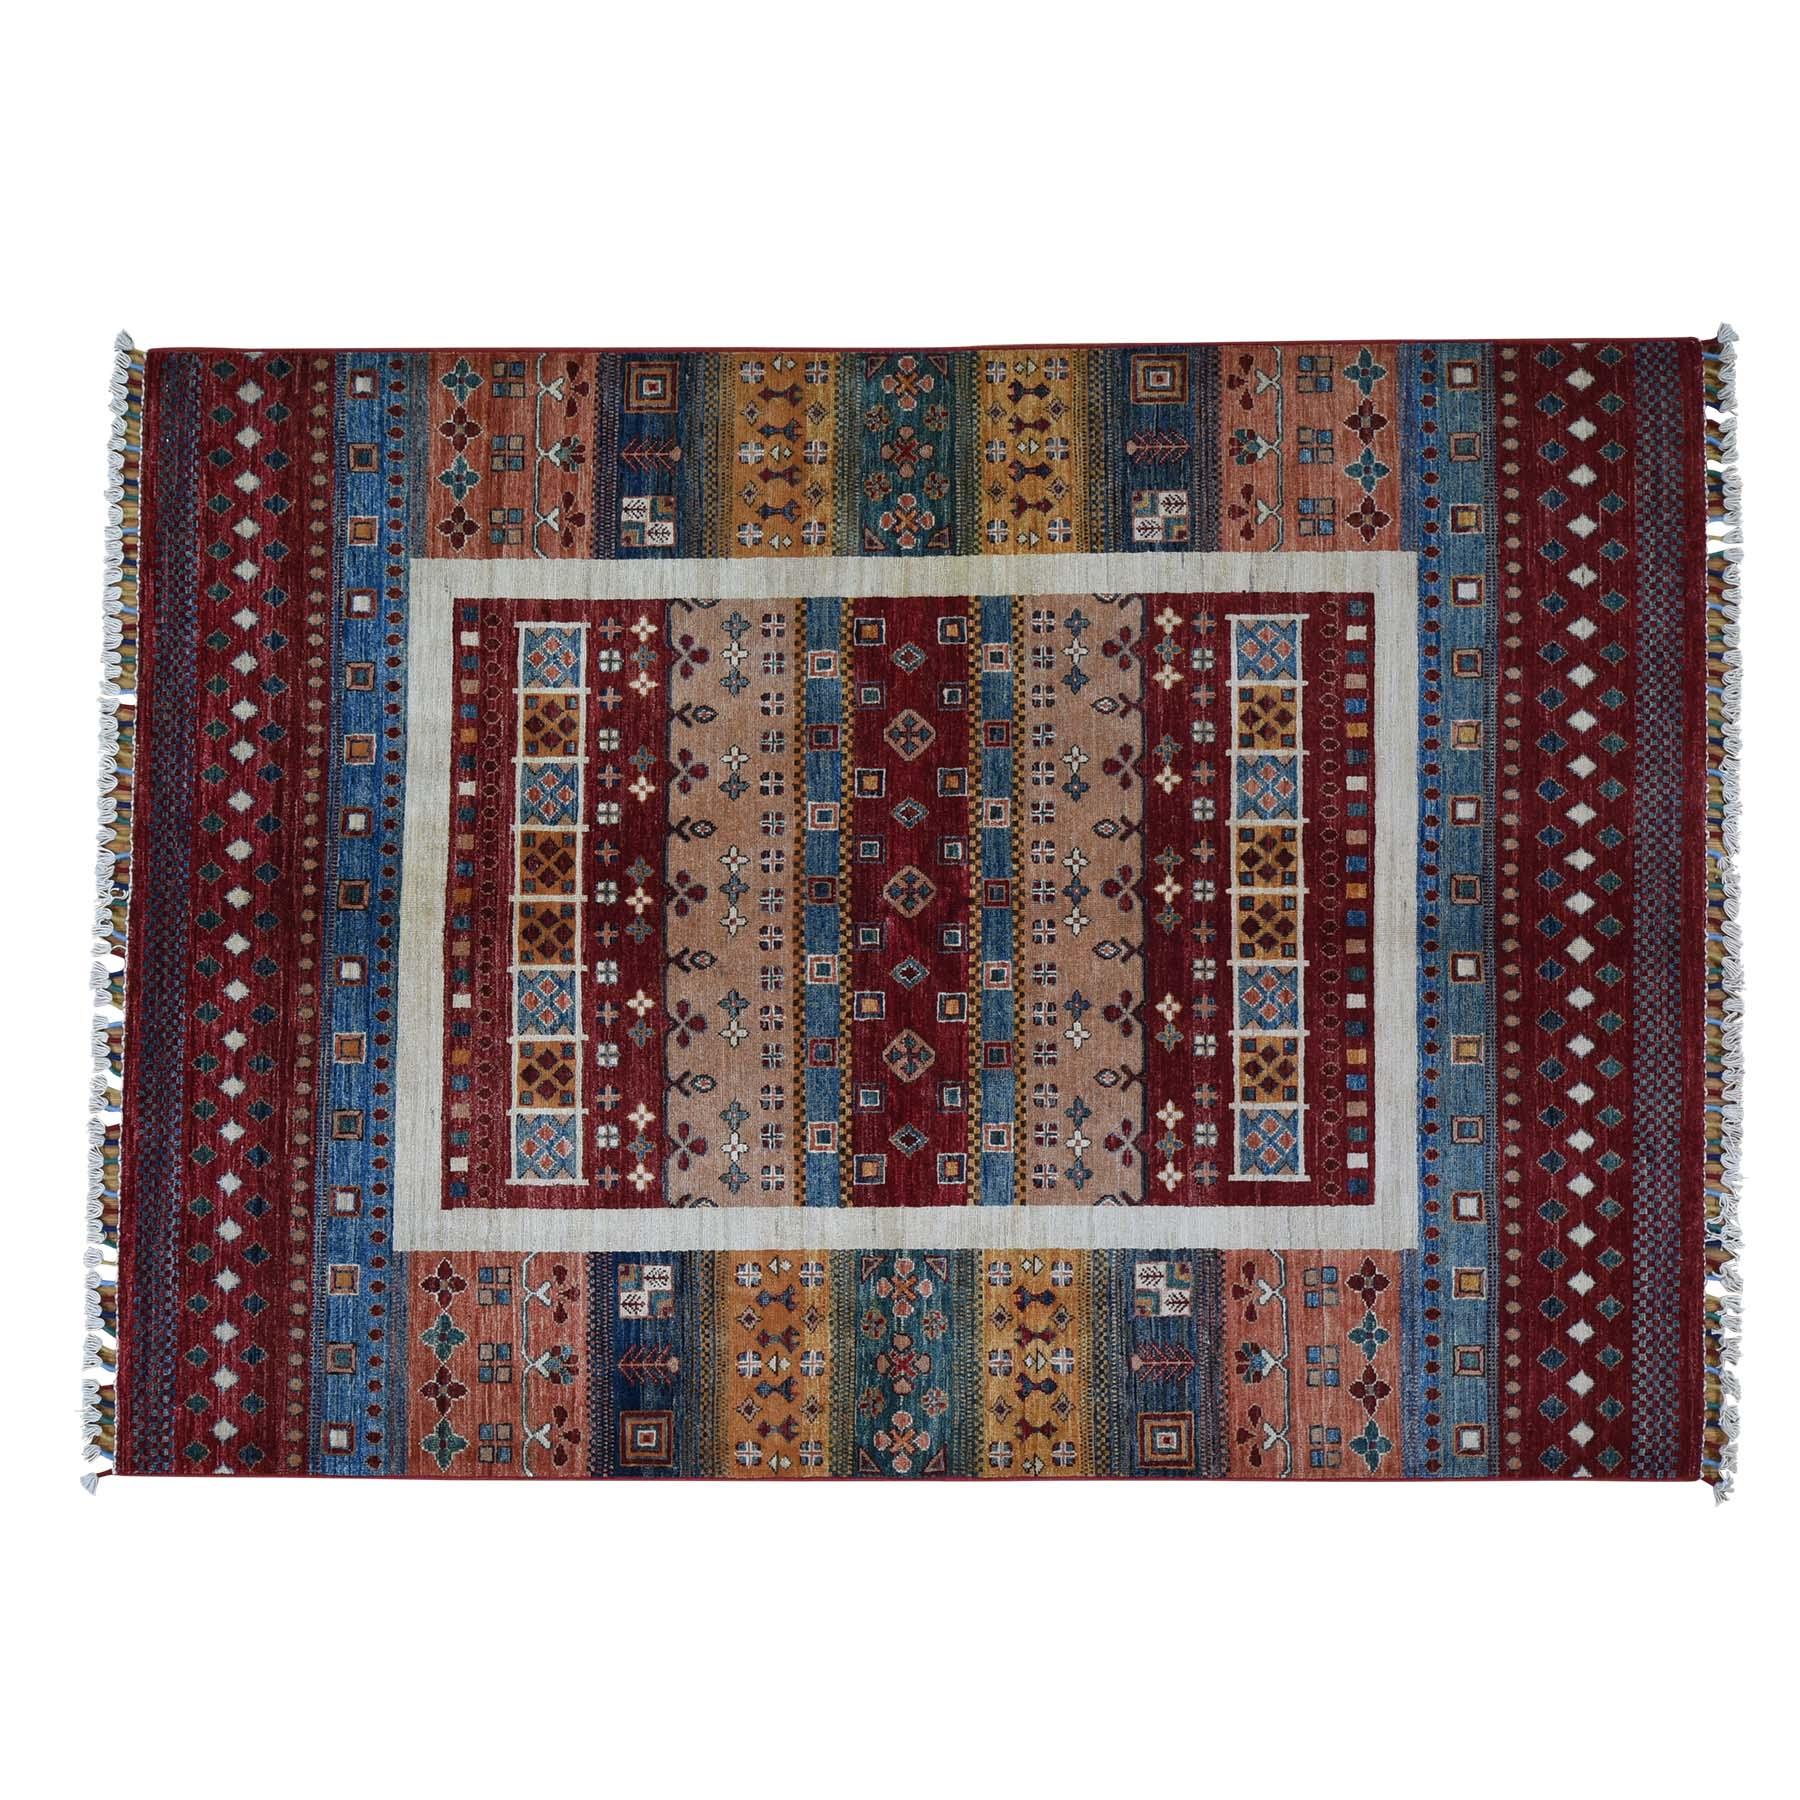 5'x7' Super Kazak Khorjin Design Hand-Knotted Pure Wool Oriental Rug